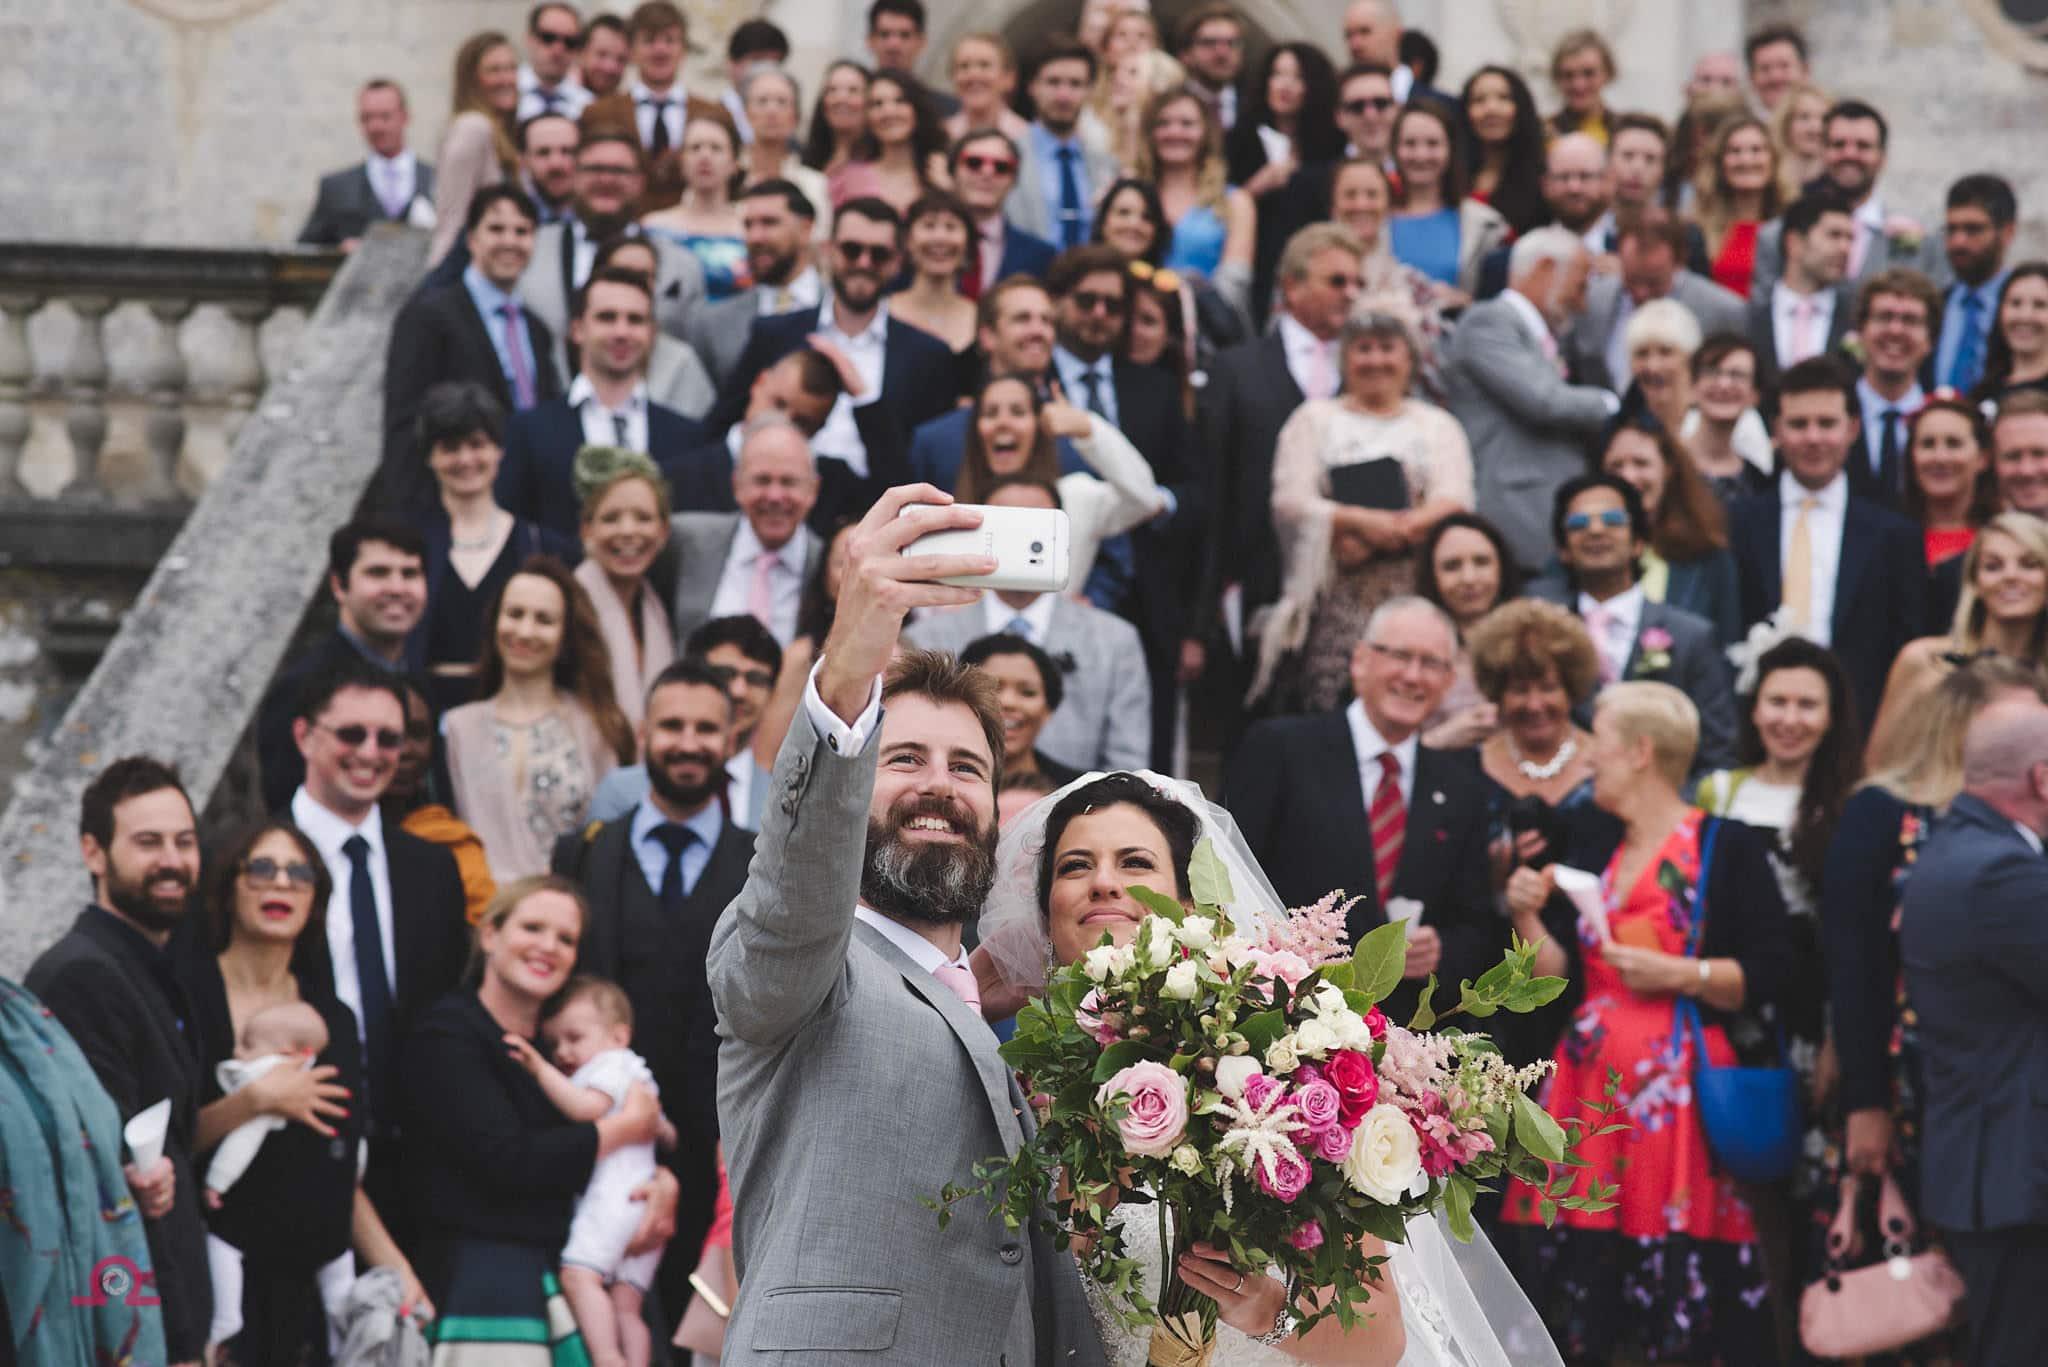 Lulworth-Castle-wedding